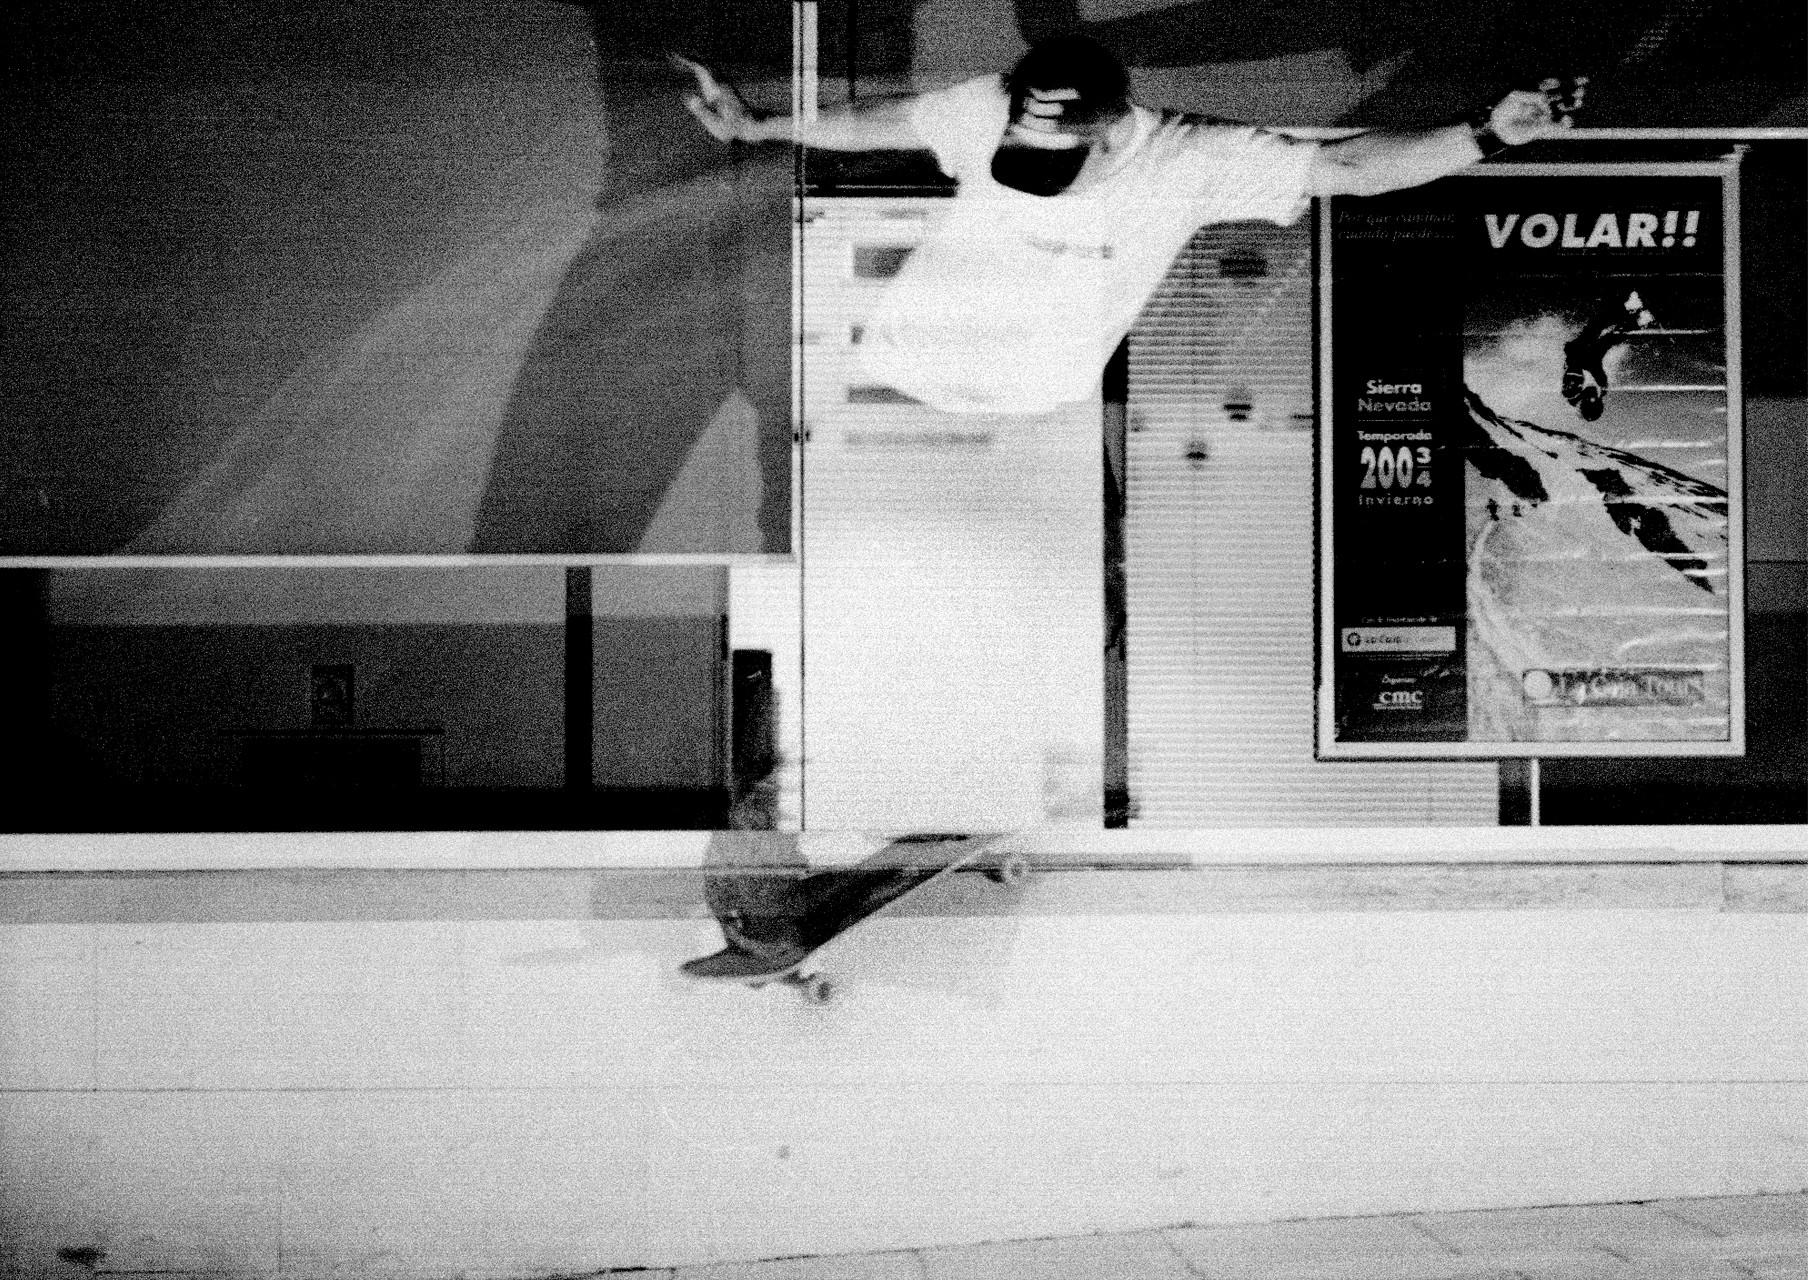 SKATE-STREET-PHOTOGRAPHY-18-JUANMI-MARQUEZ-1761x1280-1761x1280